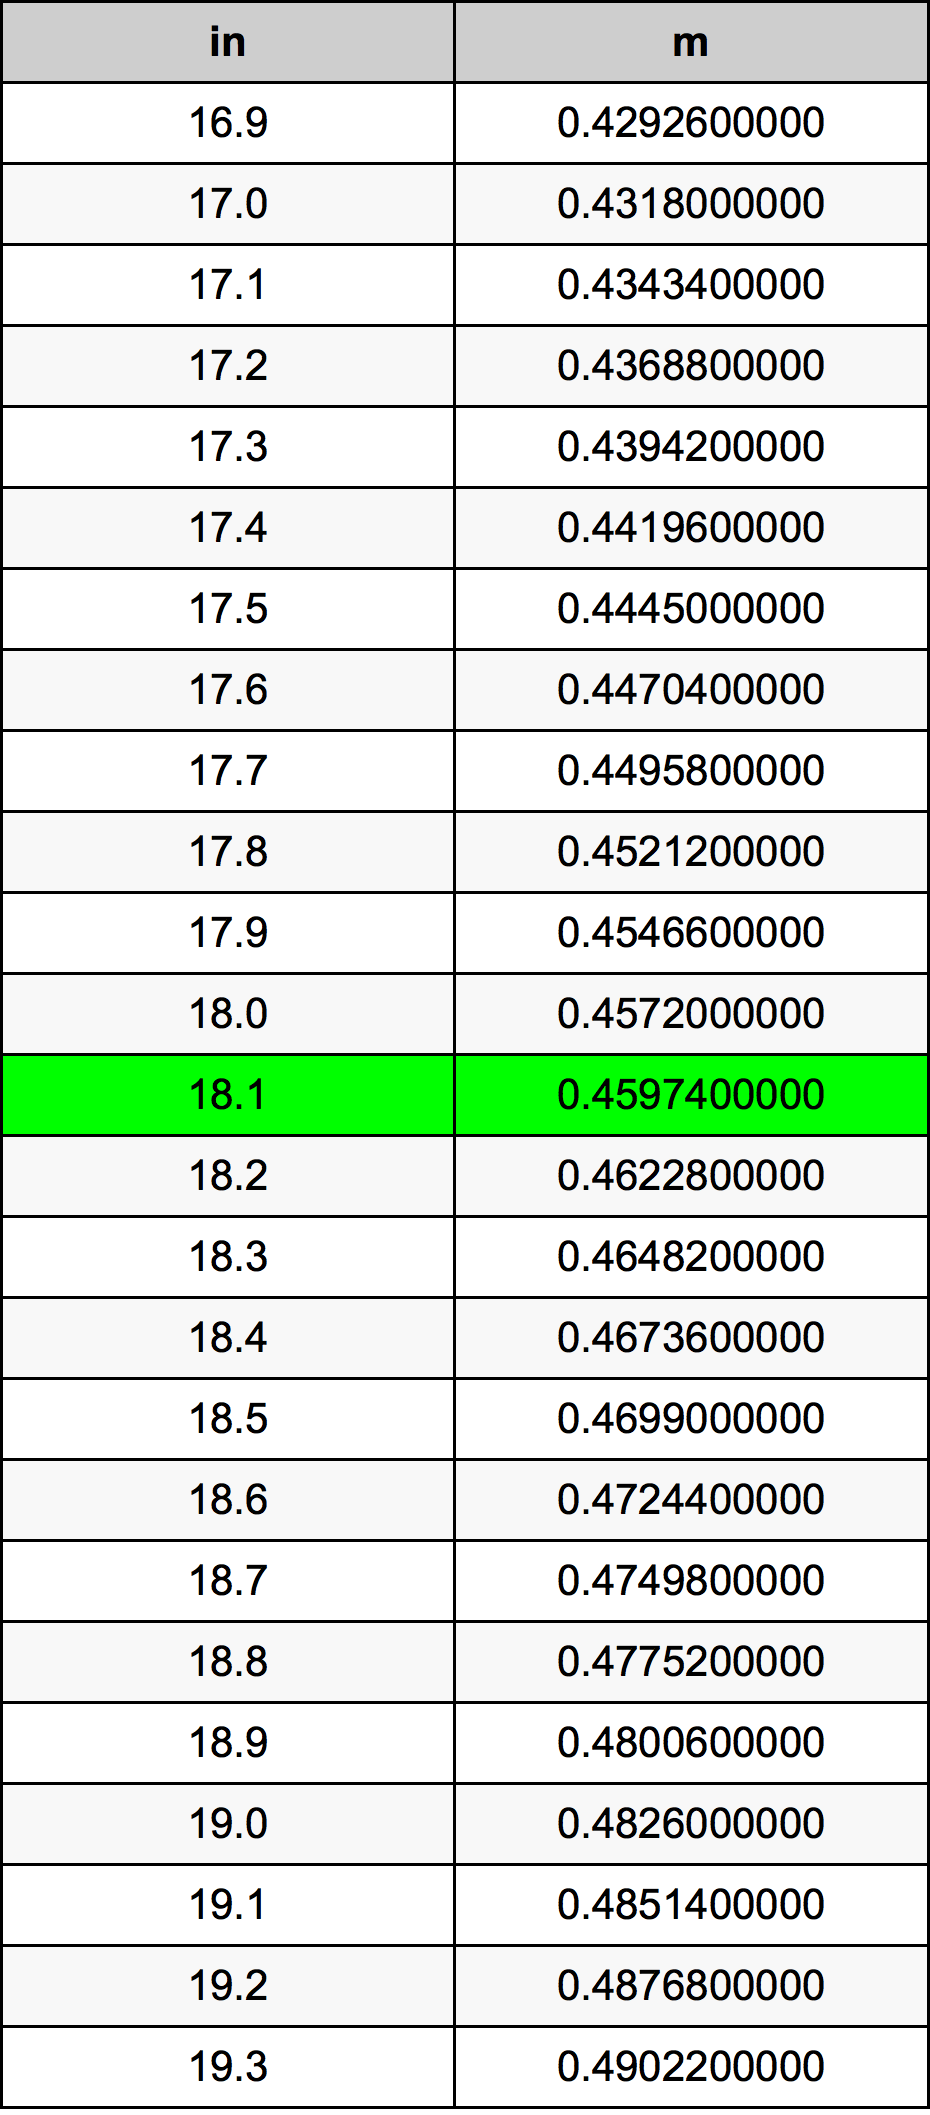 18.1 इंच रूपांतरण सारणी